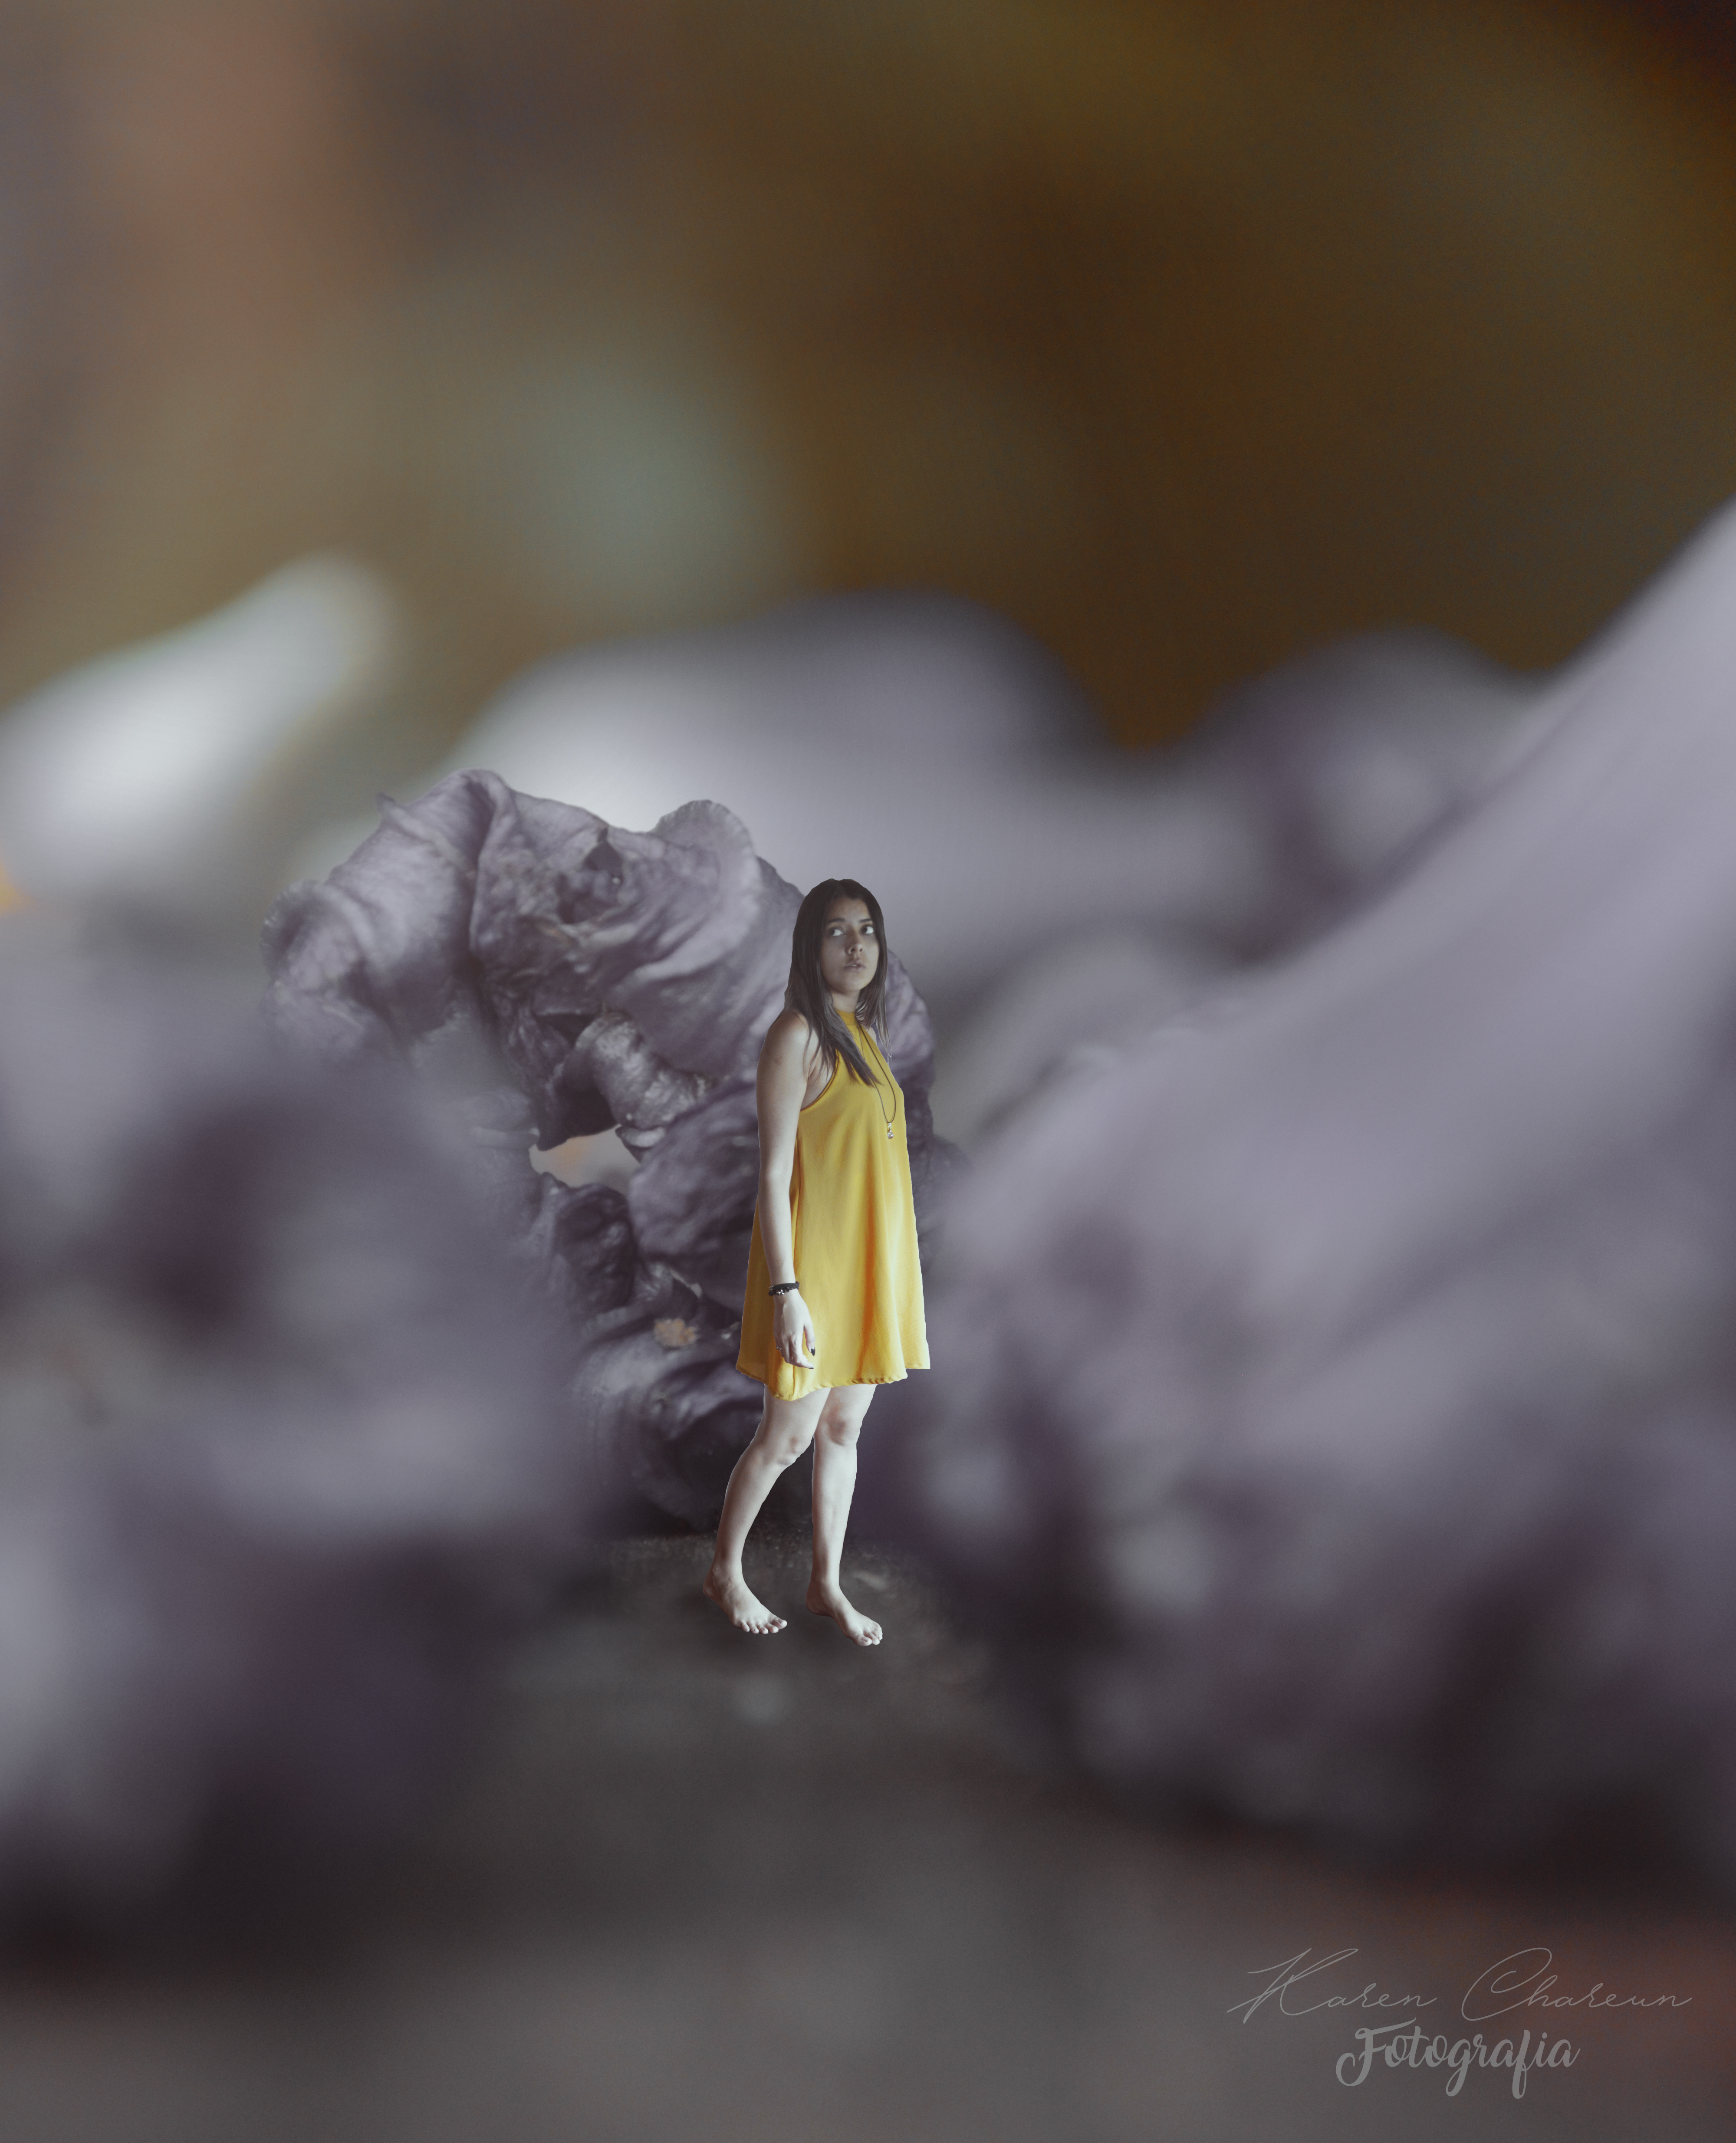 Explorando by Kathechareun